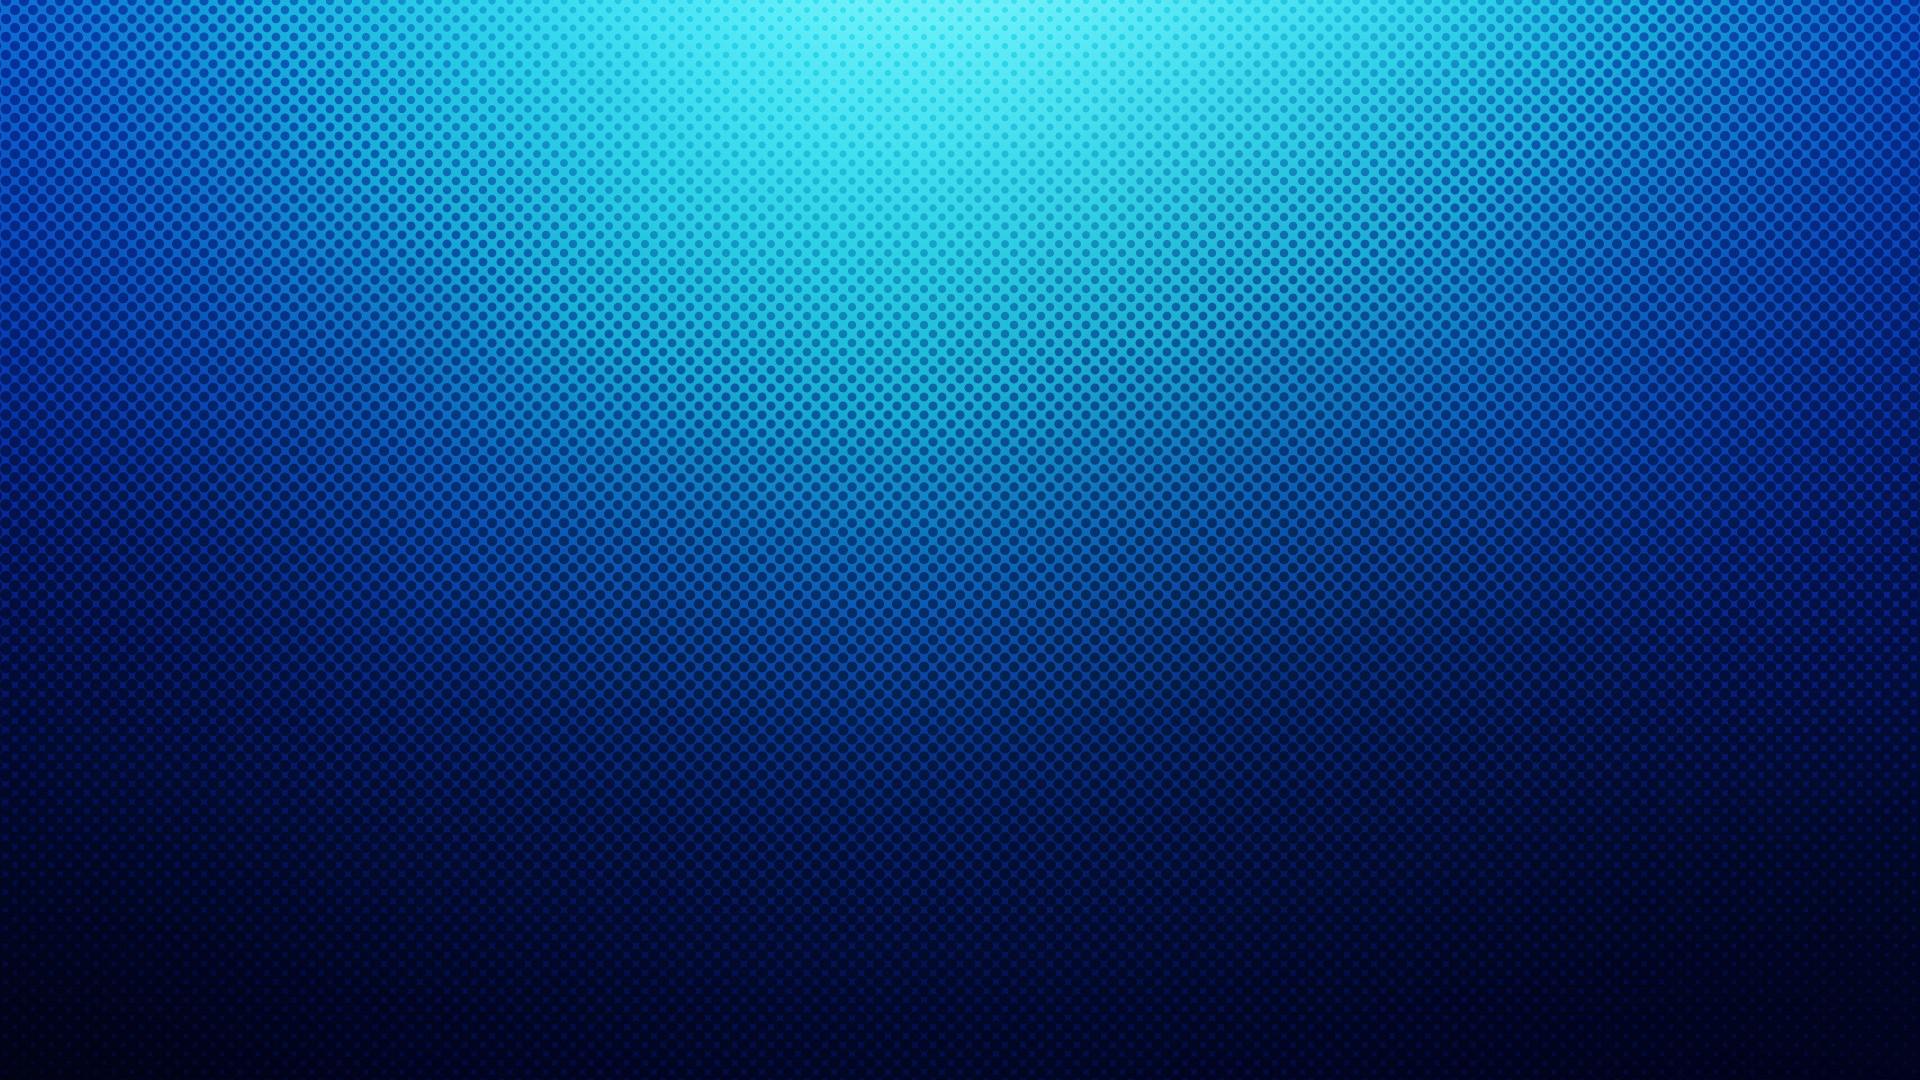 Translucent wallpaper photo